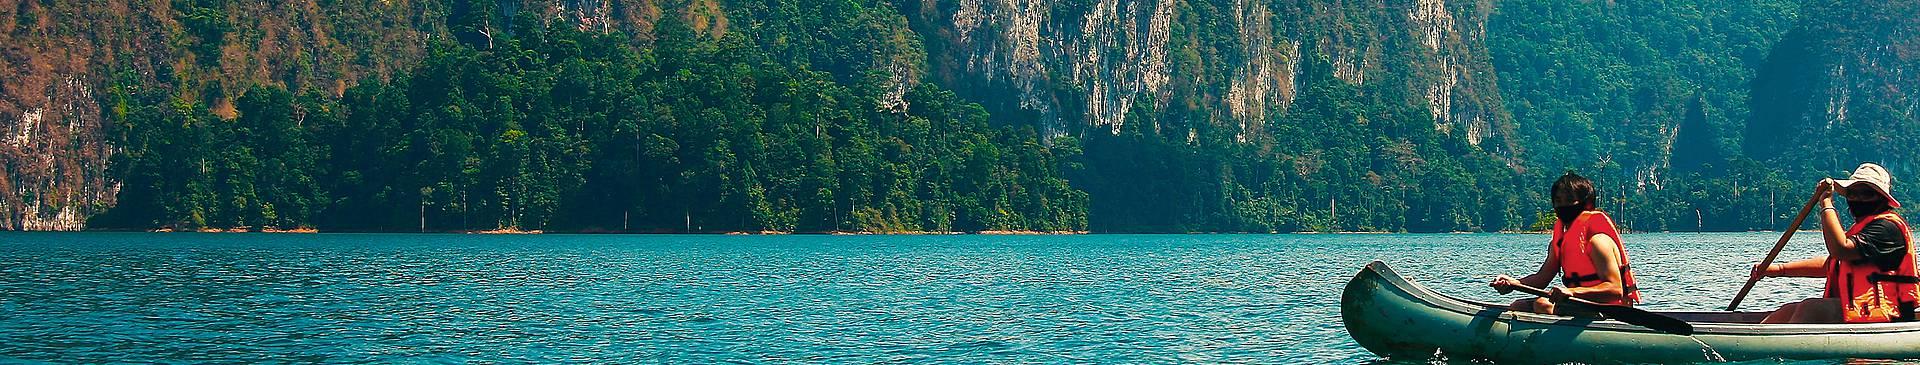 Viaggi in Thailandia in estate